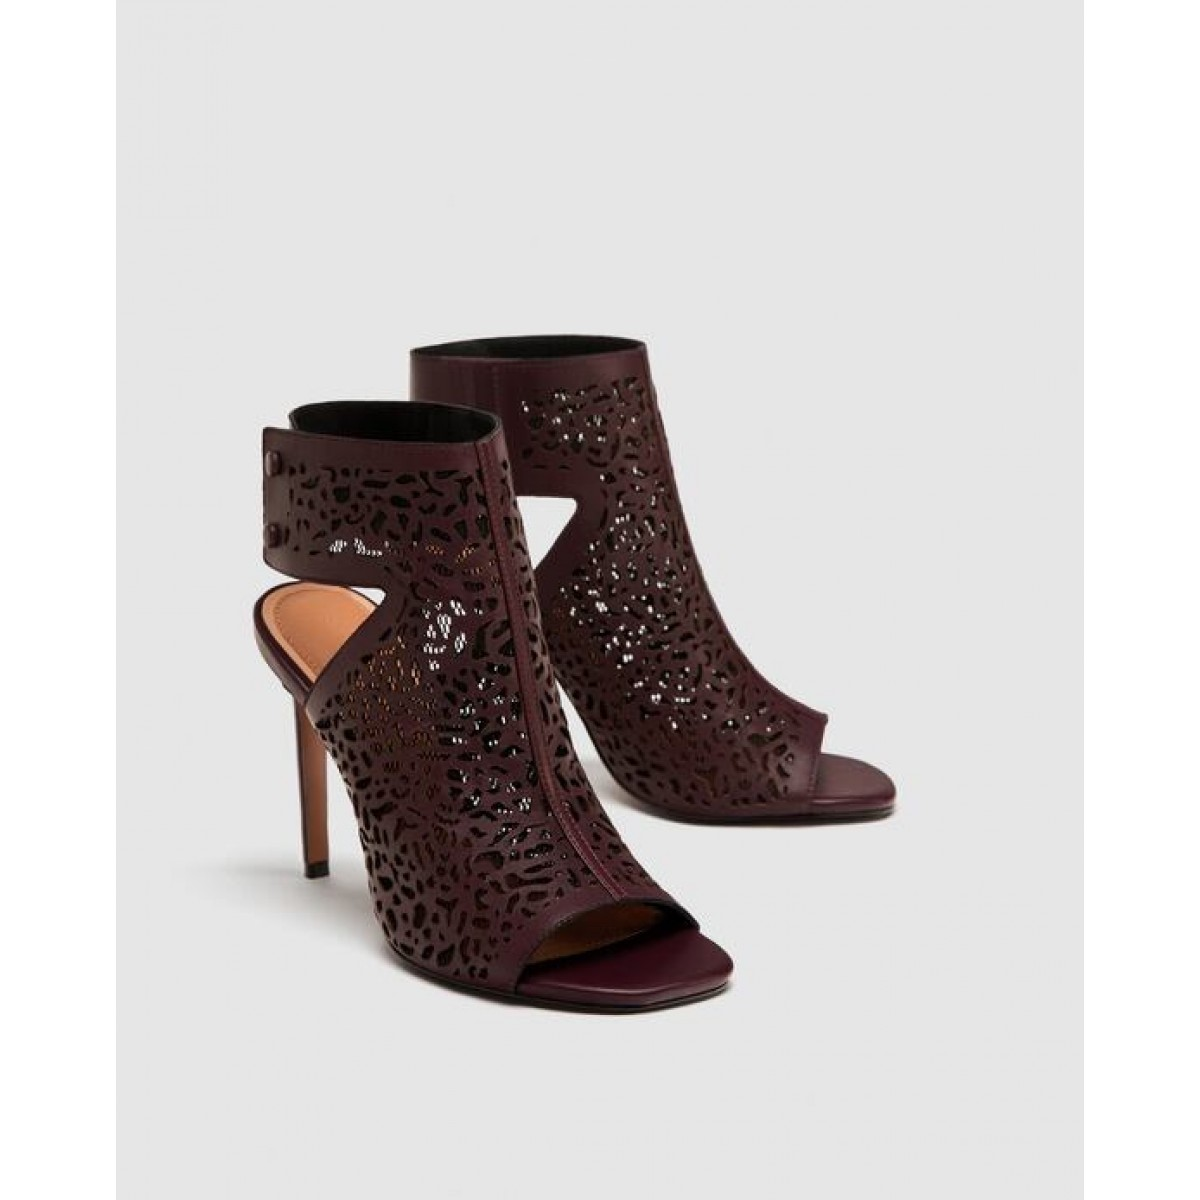 Zara Laser Cut Leather Sandals